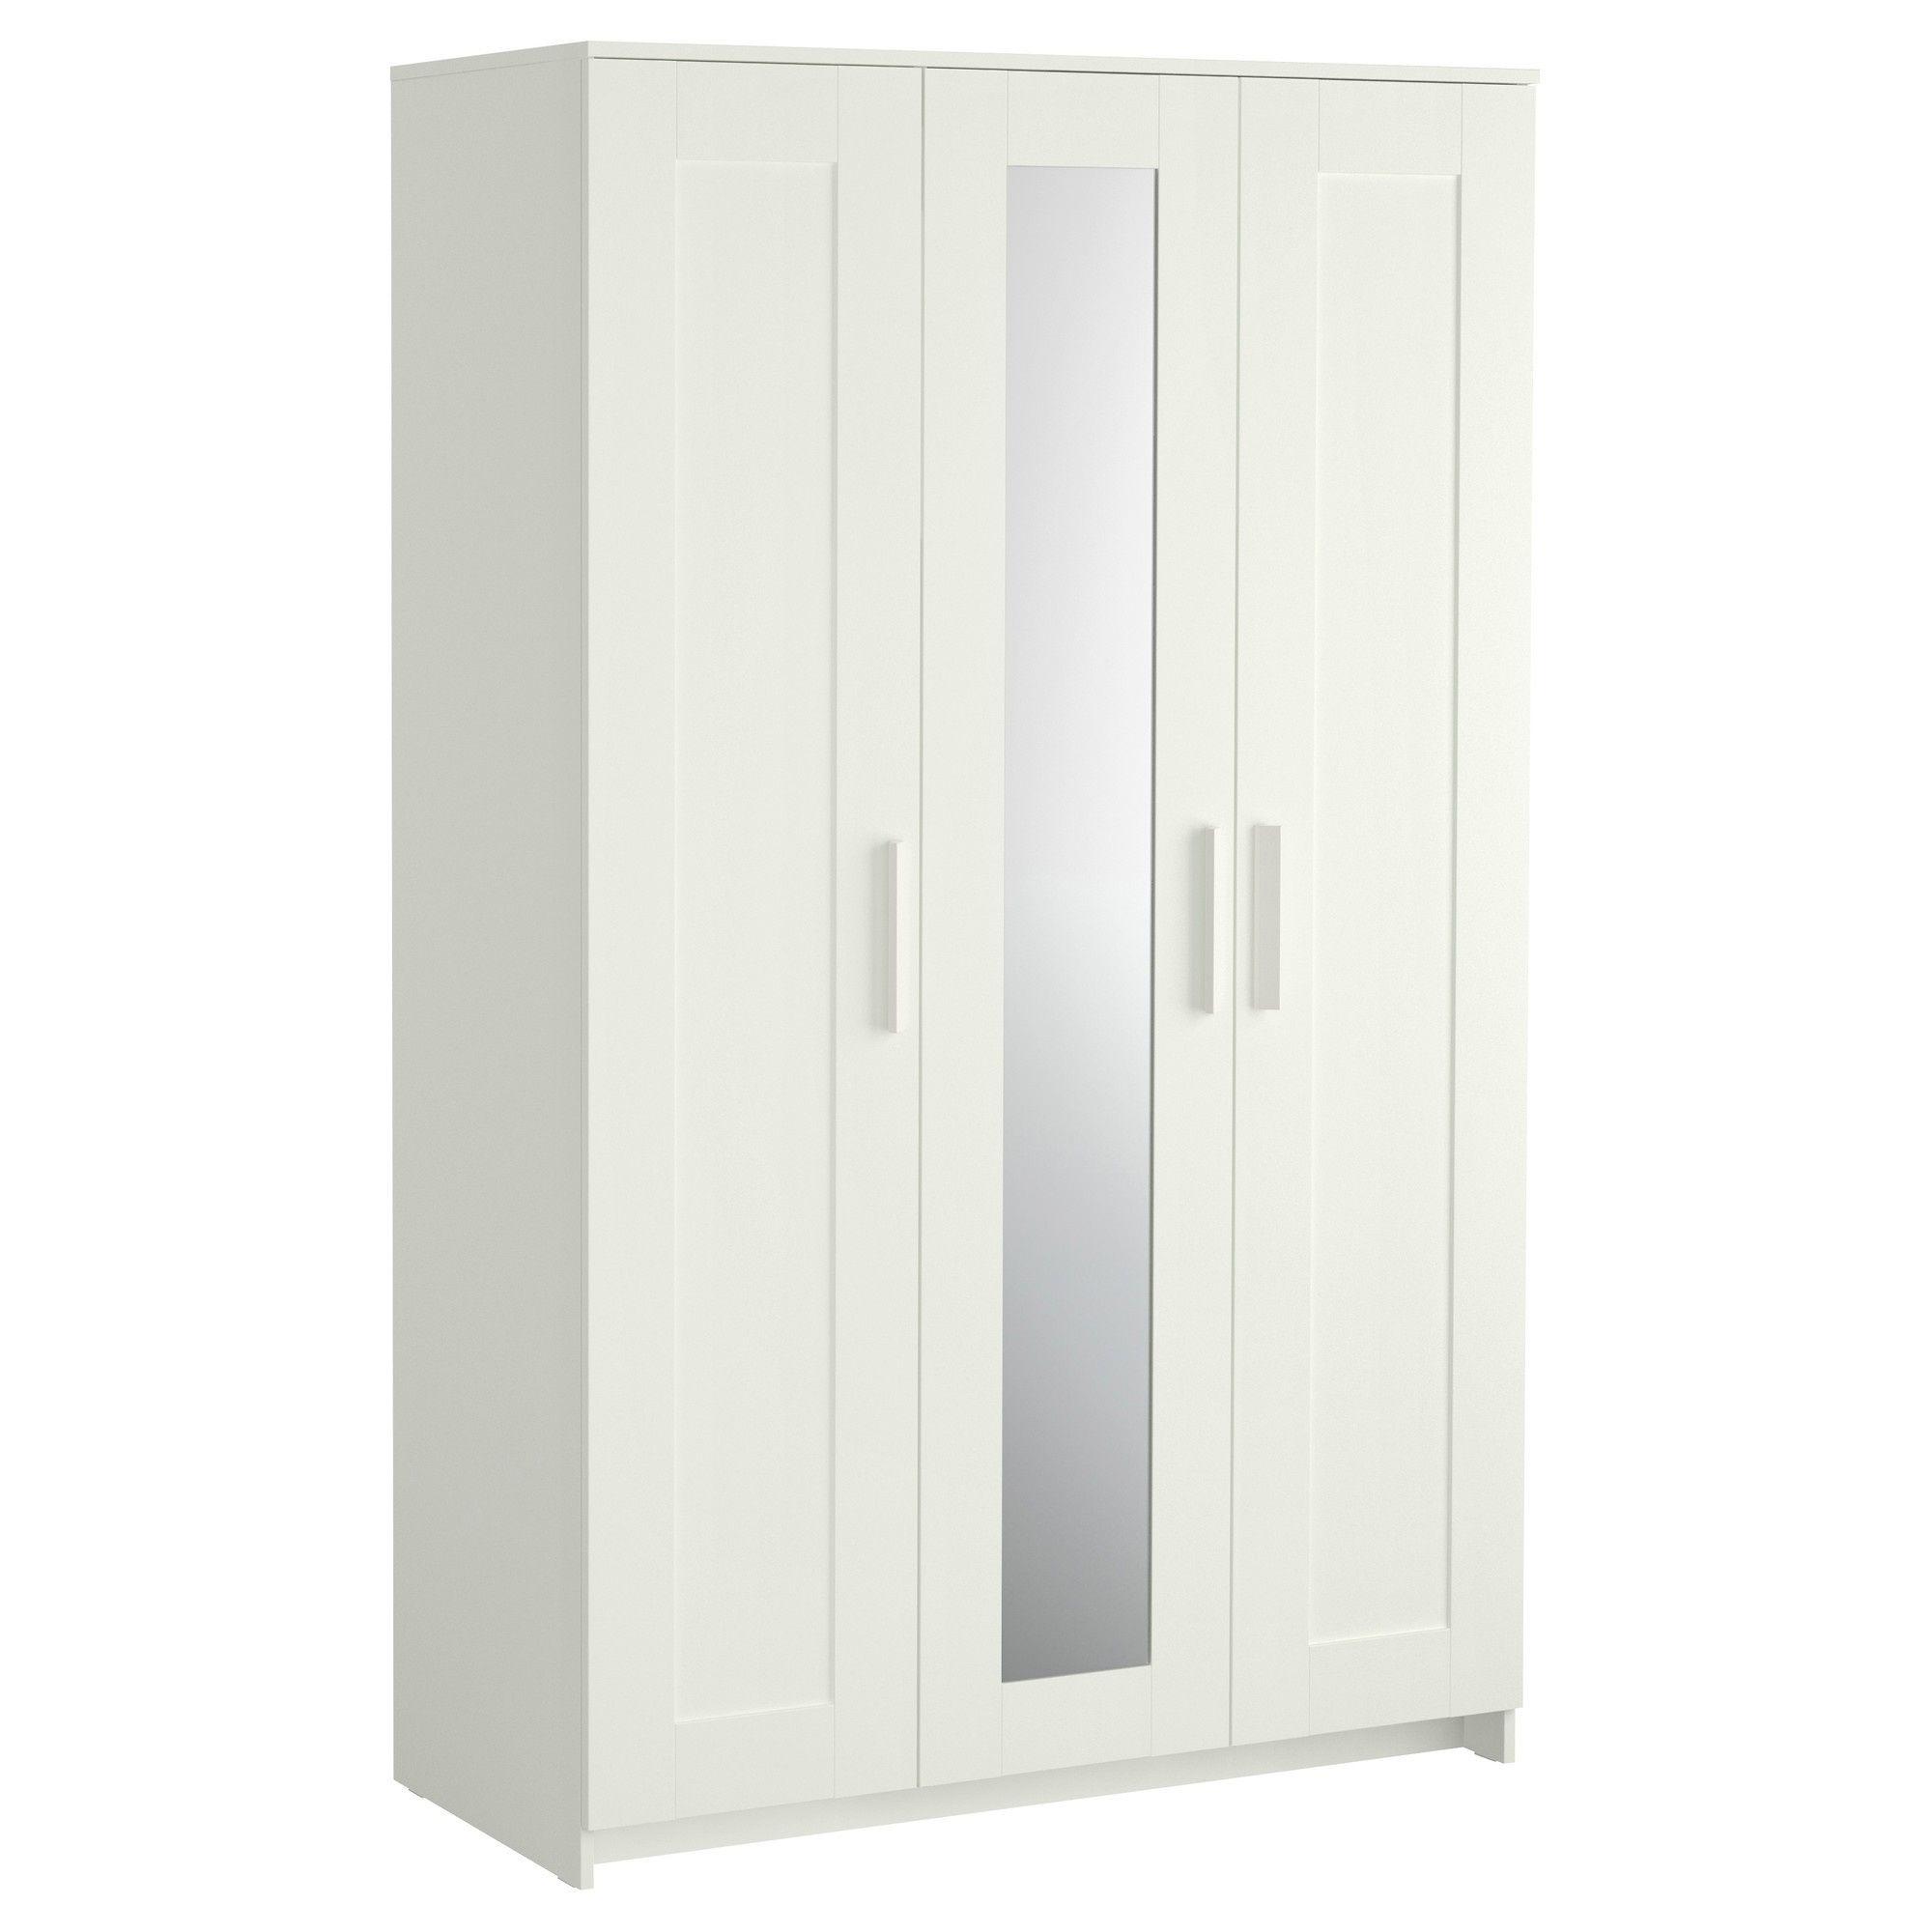 Armoire Blanche Portes Coulissantes Ikea Armoireblanche Di 2020